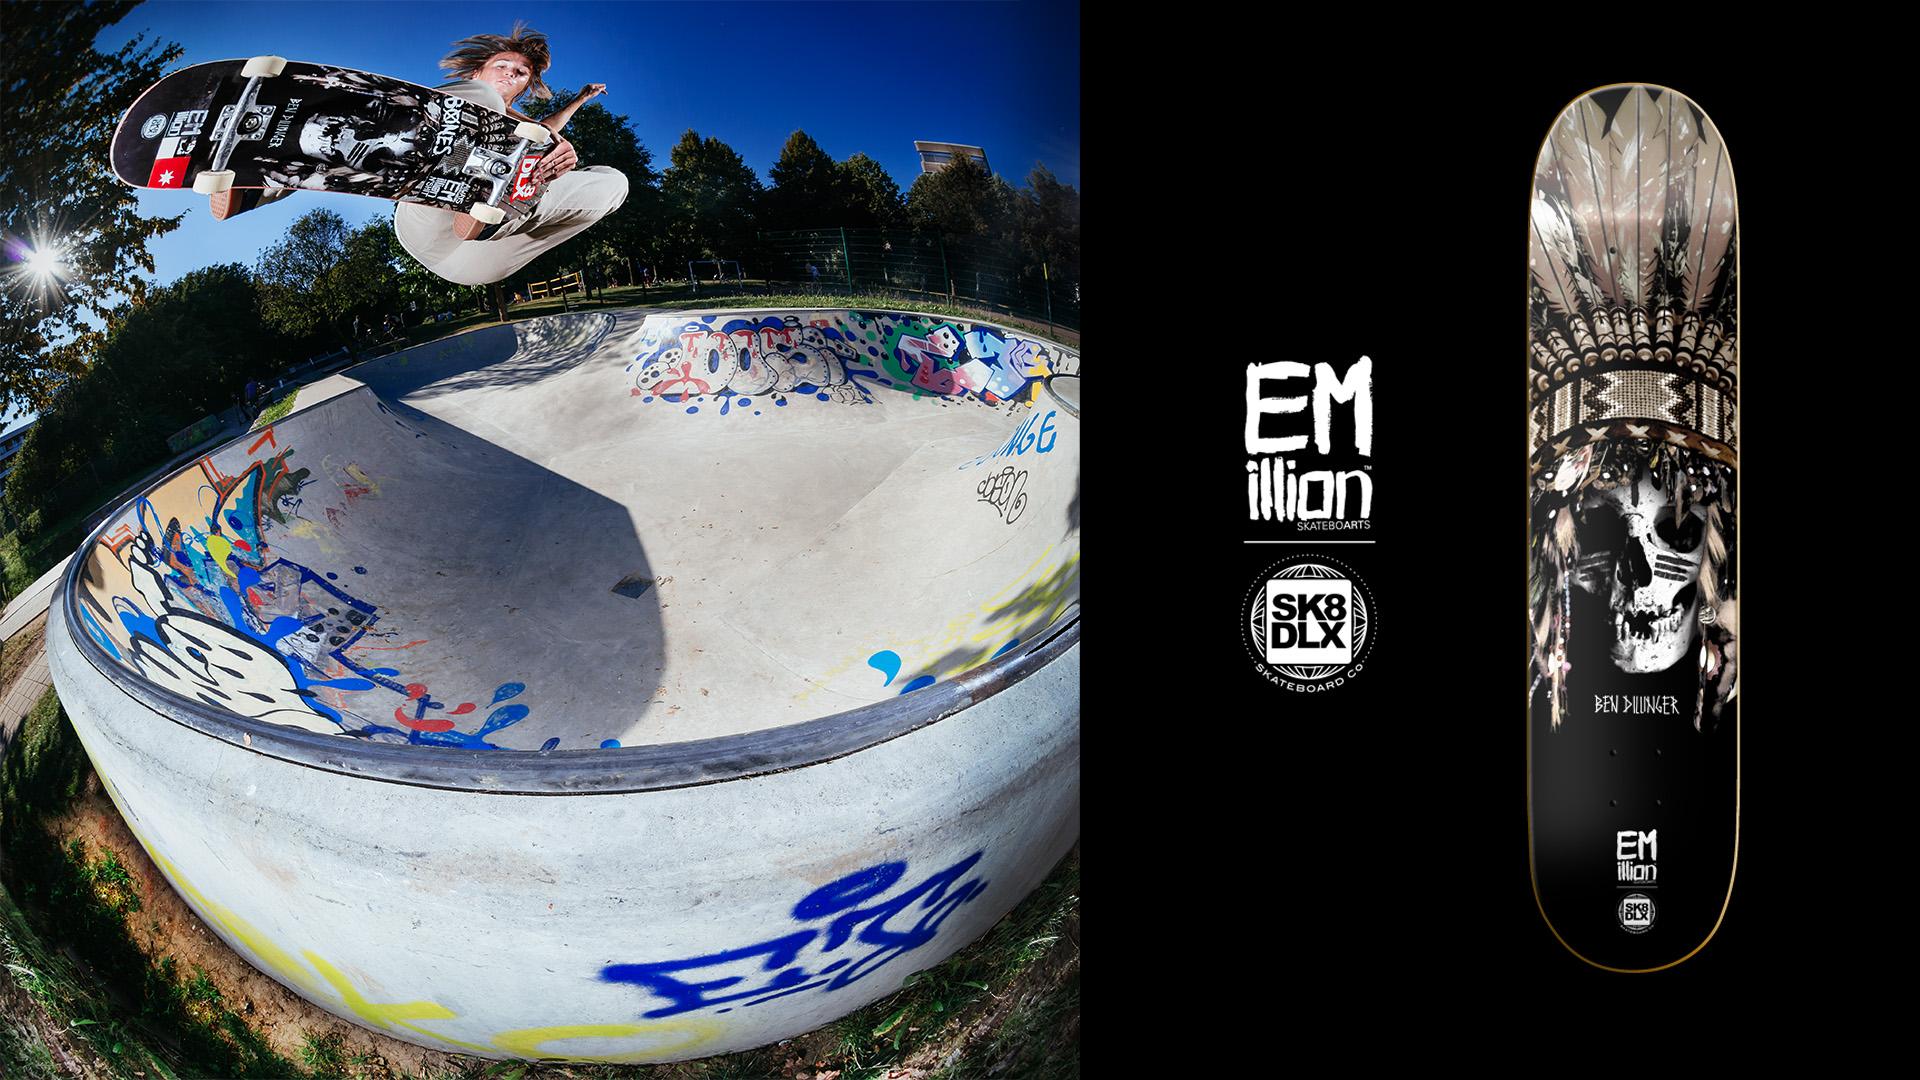 emillion-x-sk8dlx